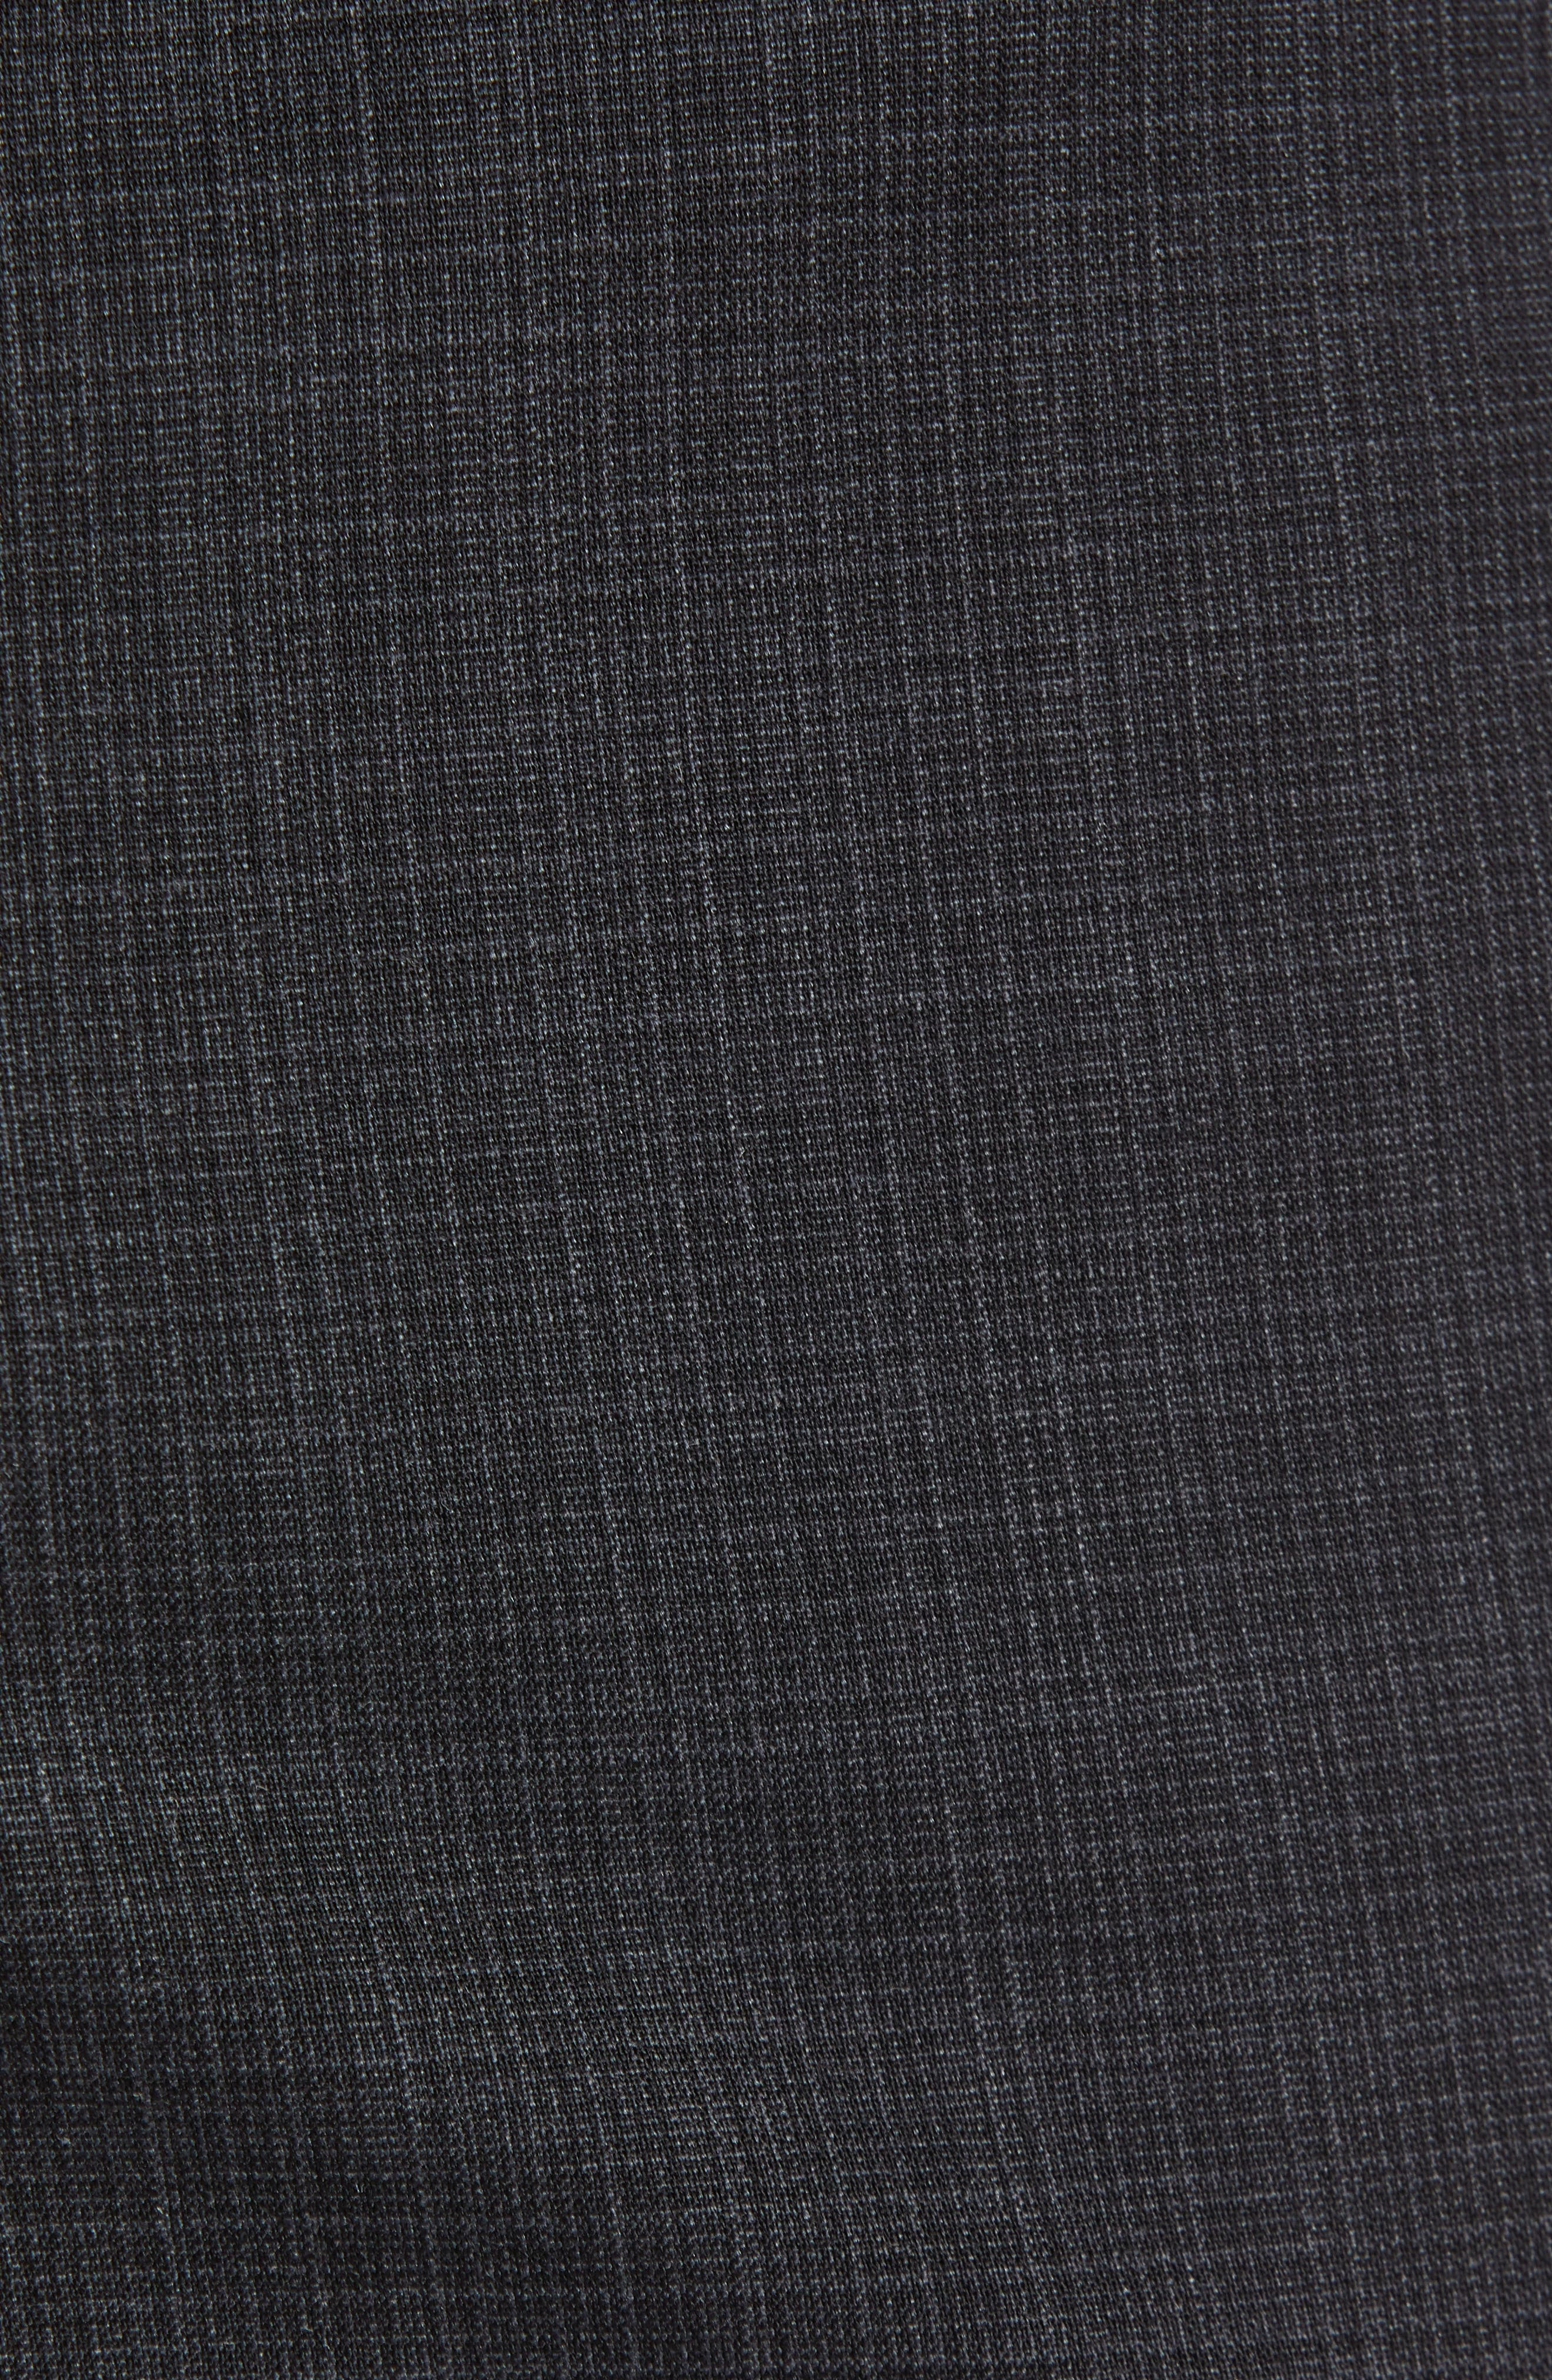 Trim Fit Flat Front Stretch Wool Pants,                             Alternate thumbnail 5, color,                             BLACK